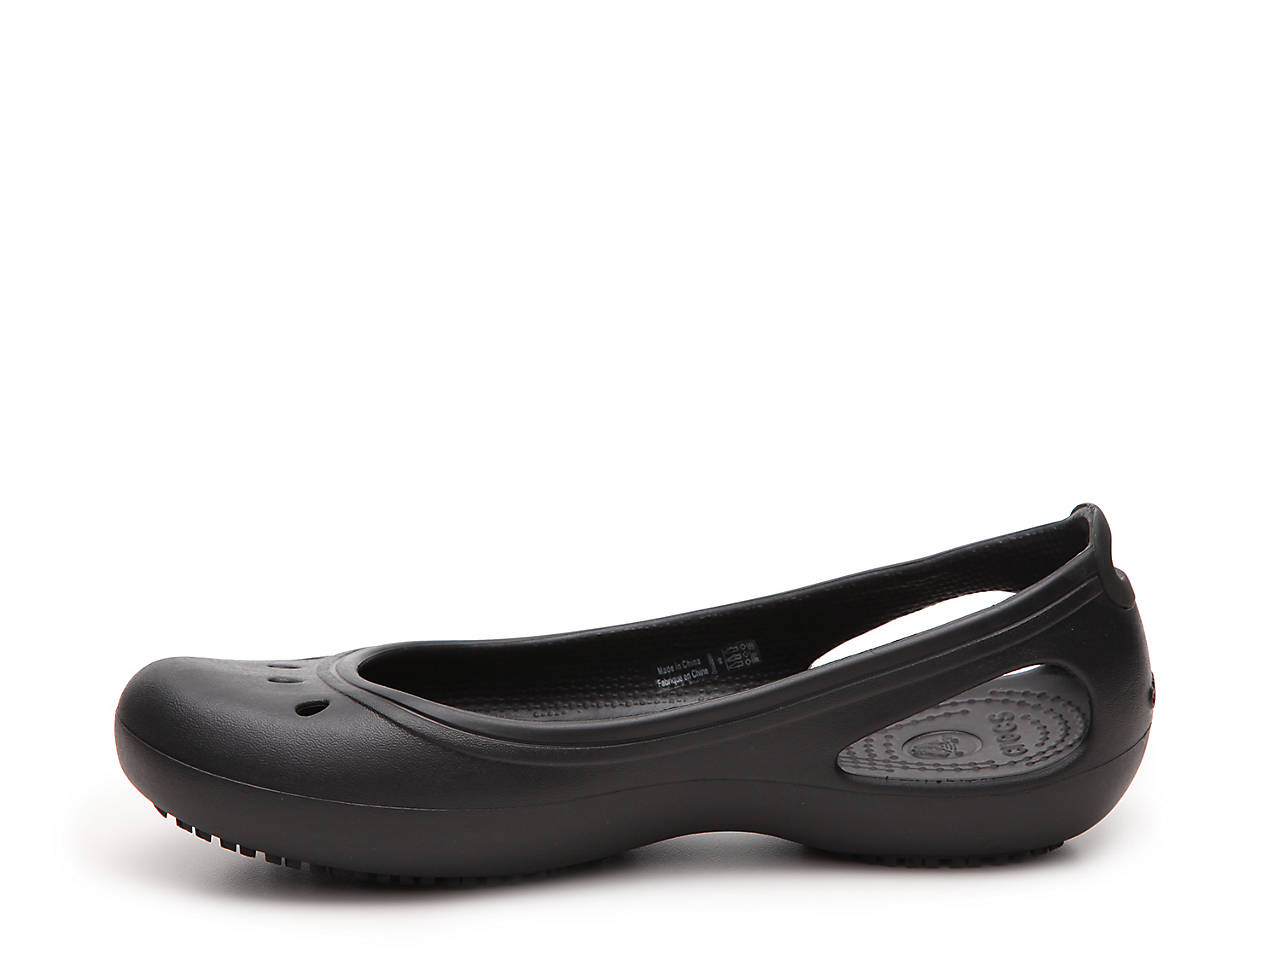 498c75eac5c710 Crocs Kadee Work Flat Women s Shoes